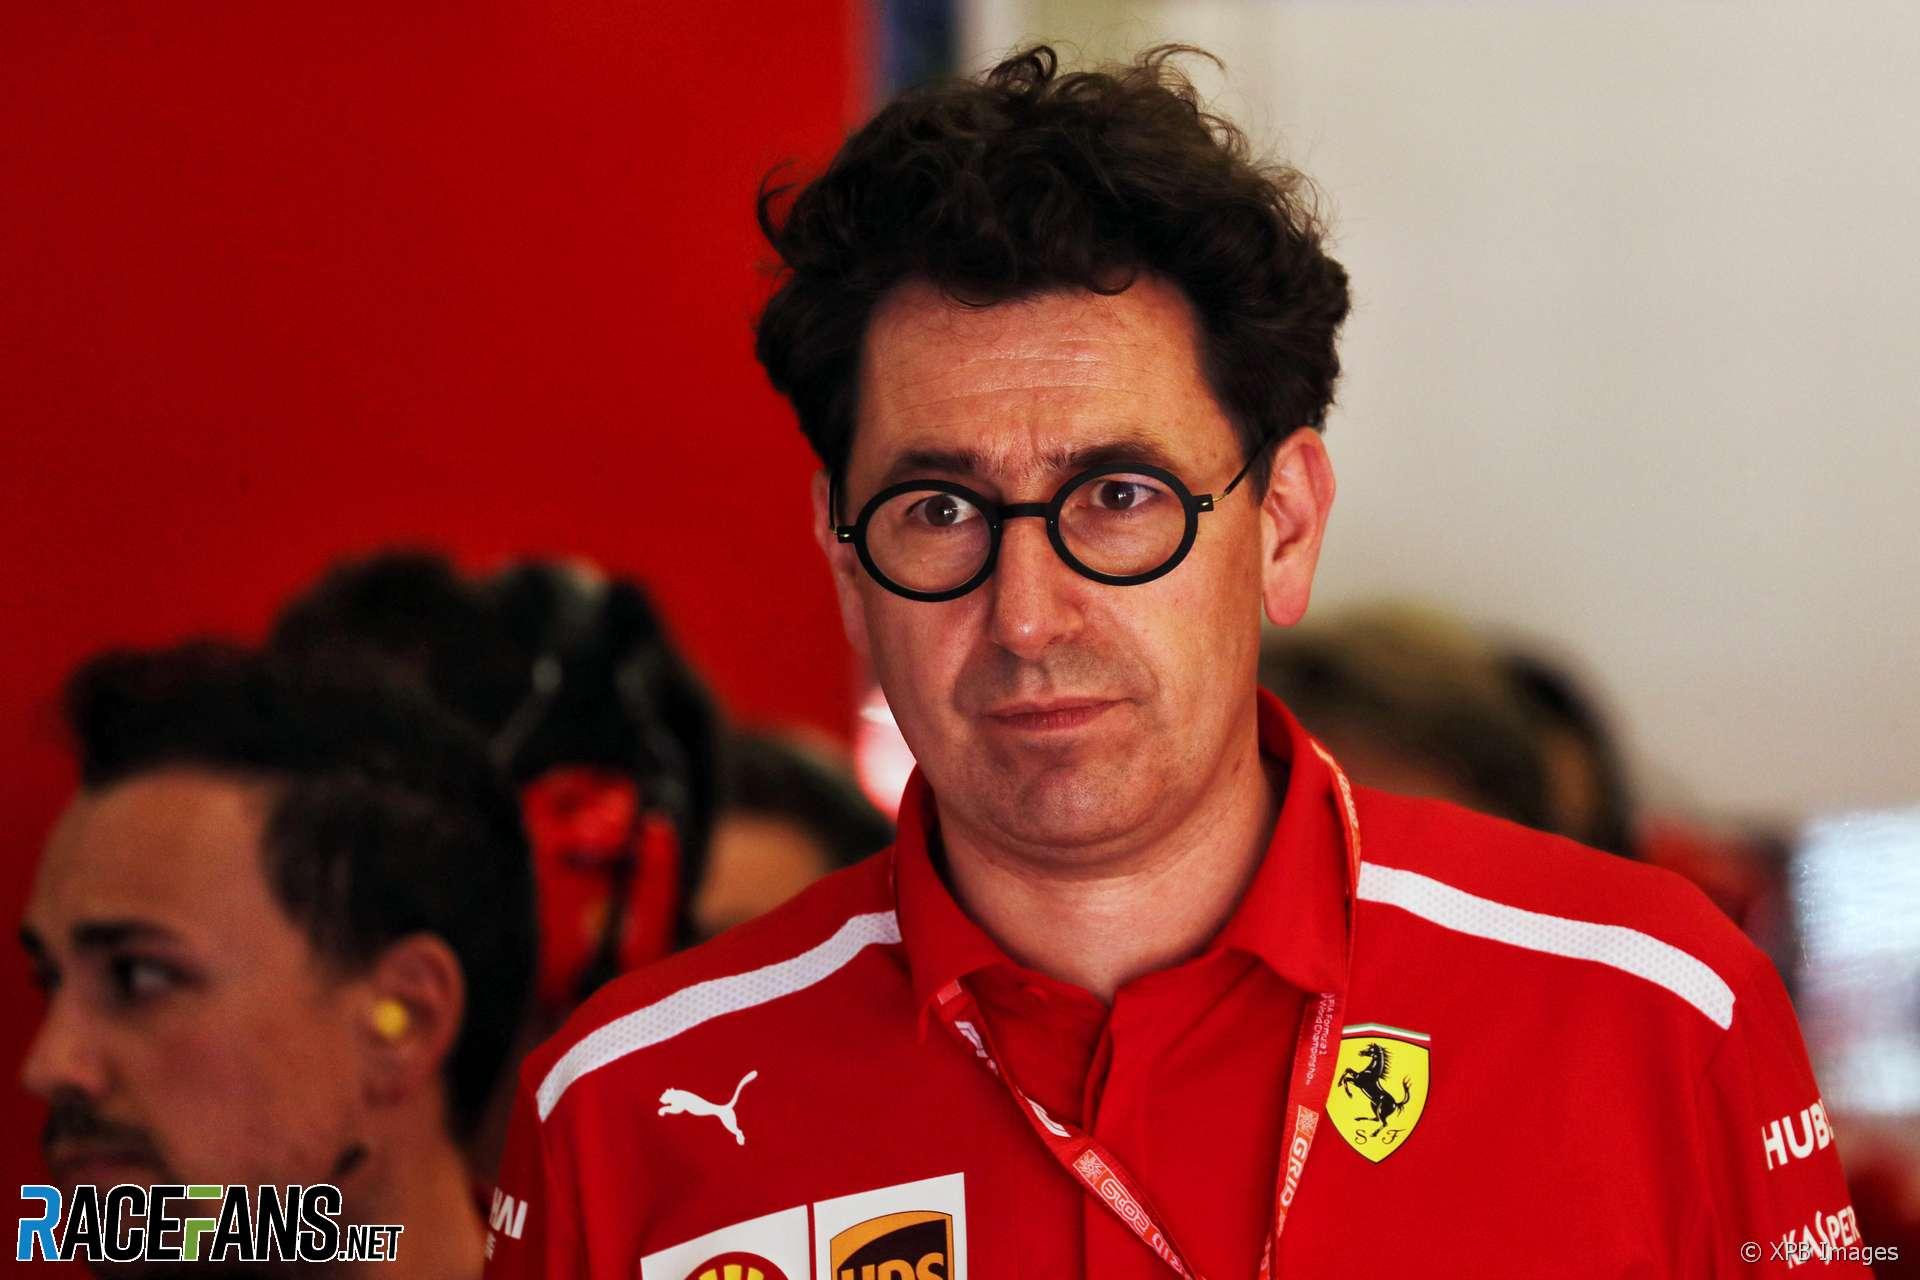 Mattia Binotto, Ferrari, Red Bull Ring, 2019